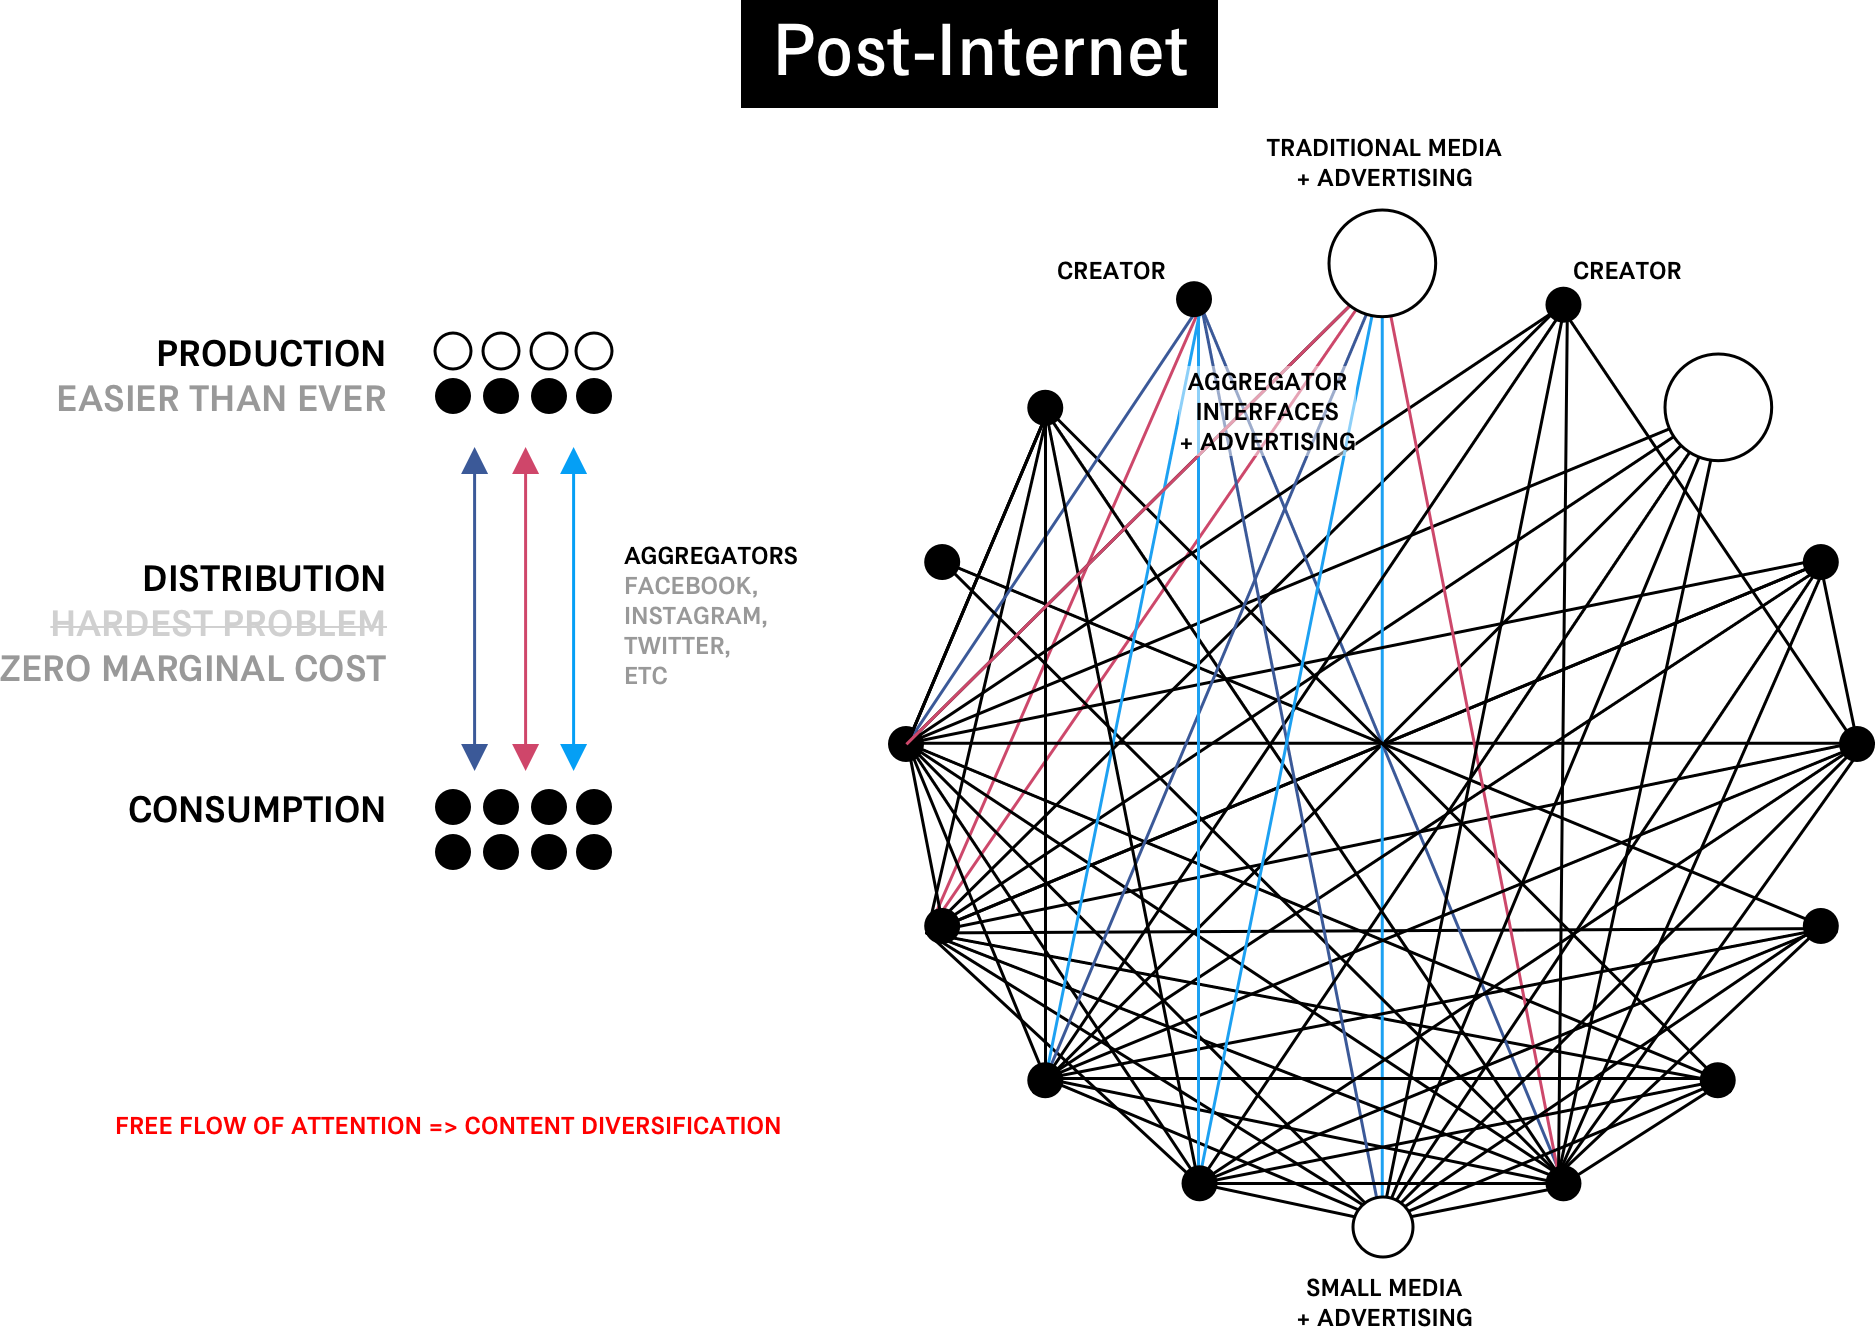 networkmodel-post-internet.png